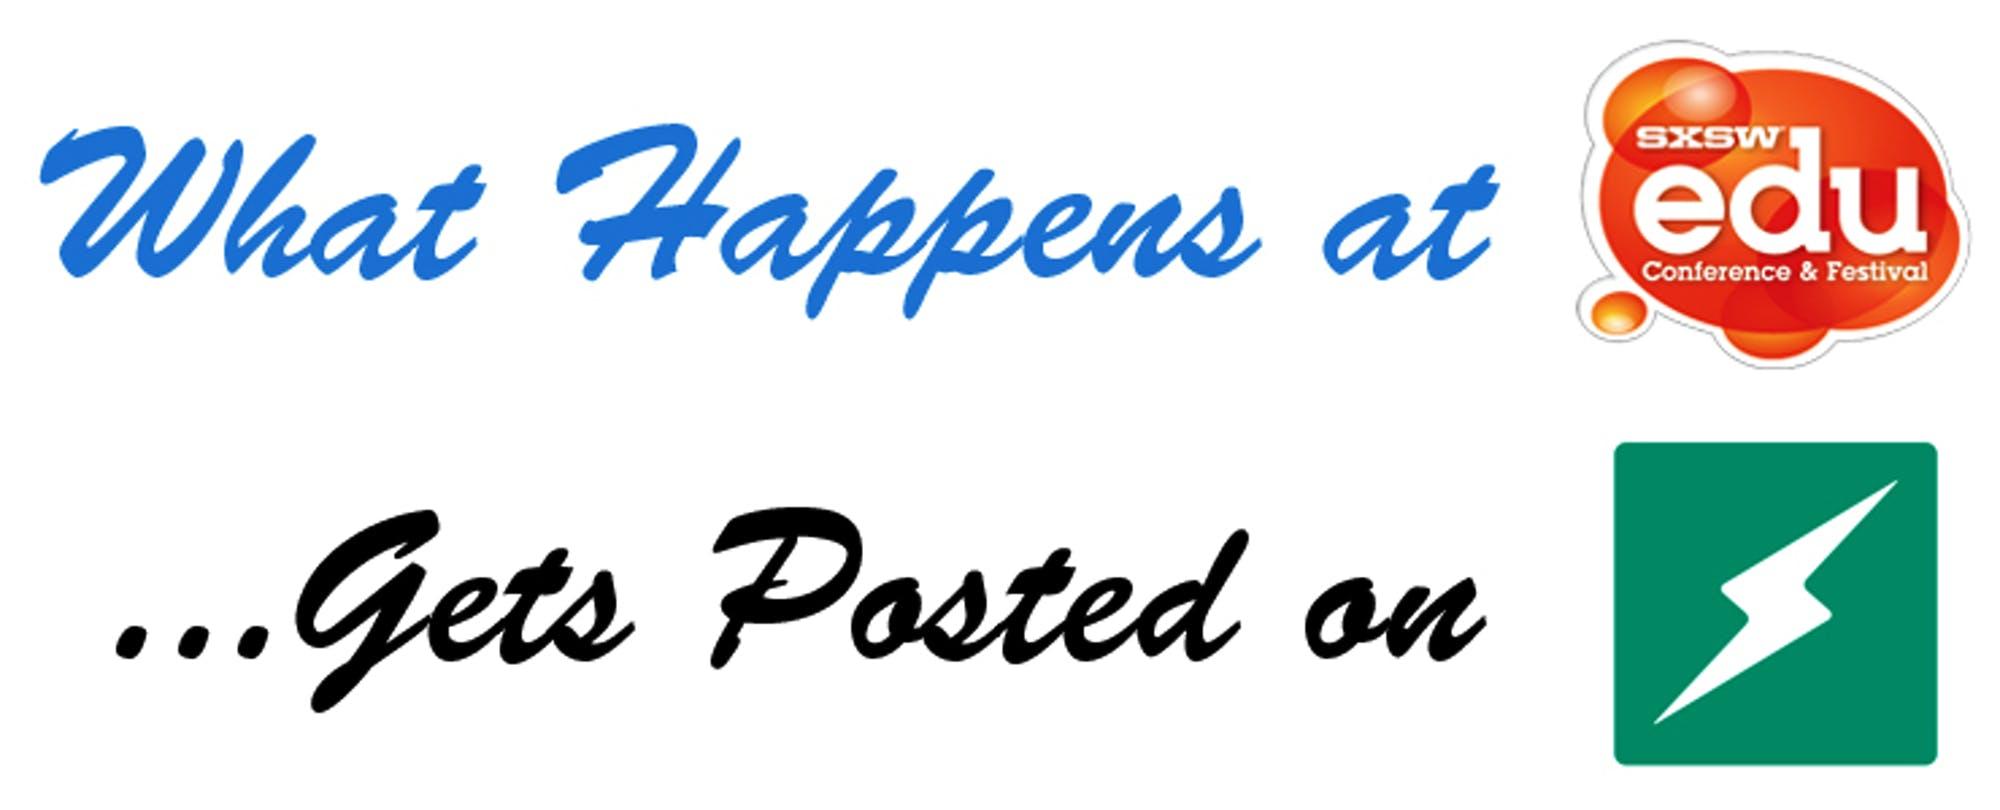 Our Cheatsheet to SXSWedu 2014